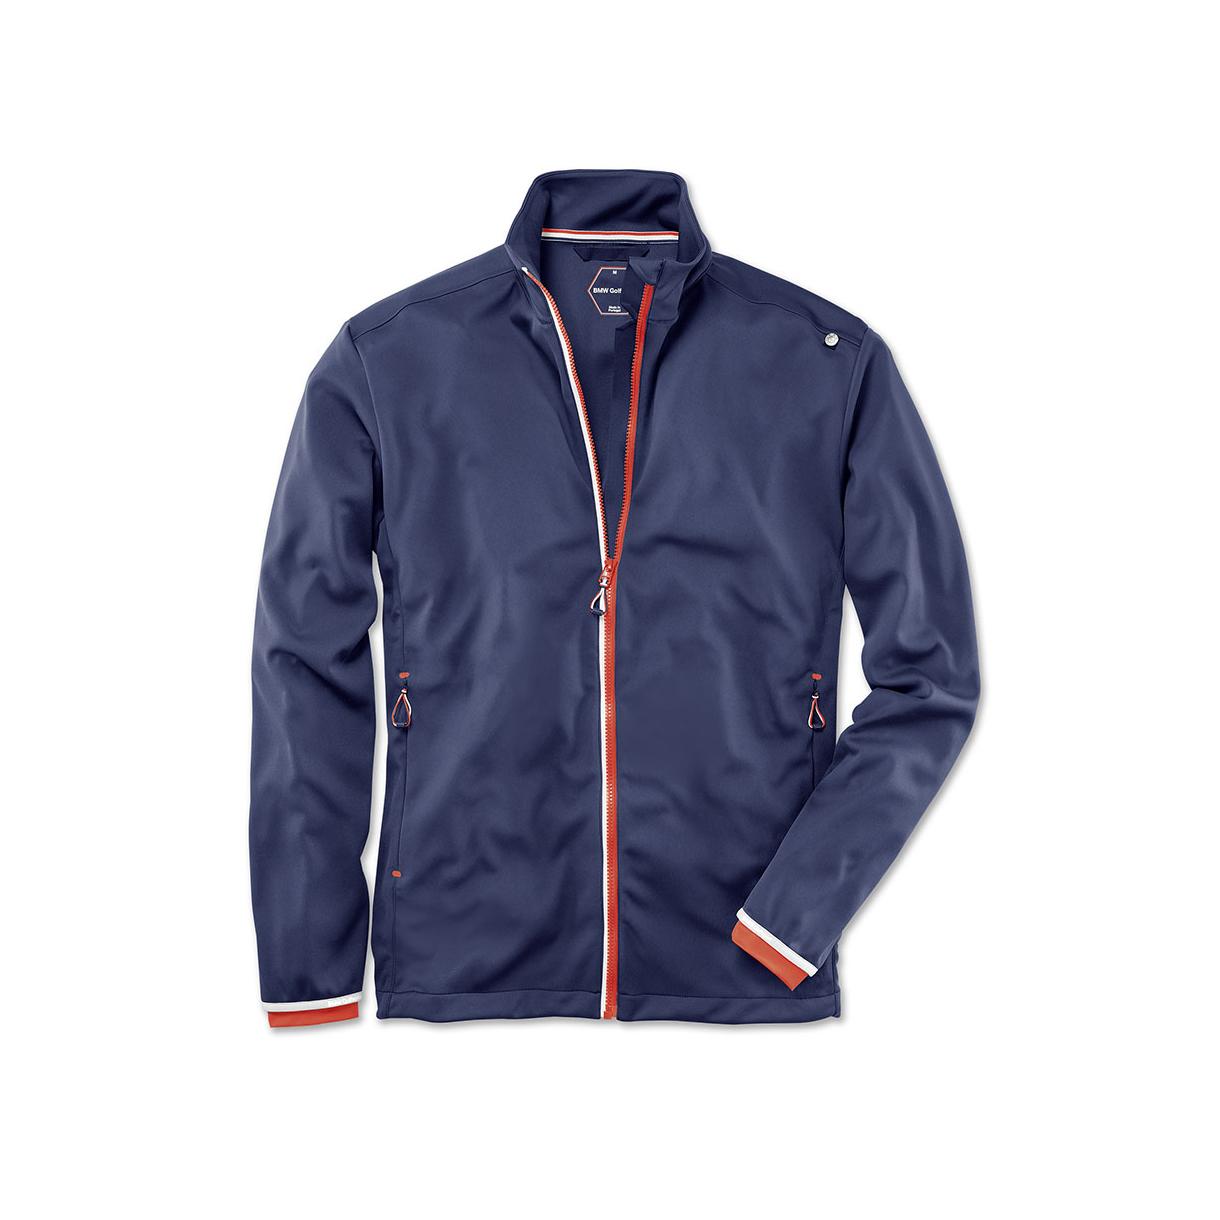 veste fonctionnelle bmw golfsport homme dans bmw lifestyle golfsport boutique accessoires. Black Bedroom Furniture Sets. Home Design Ideas